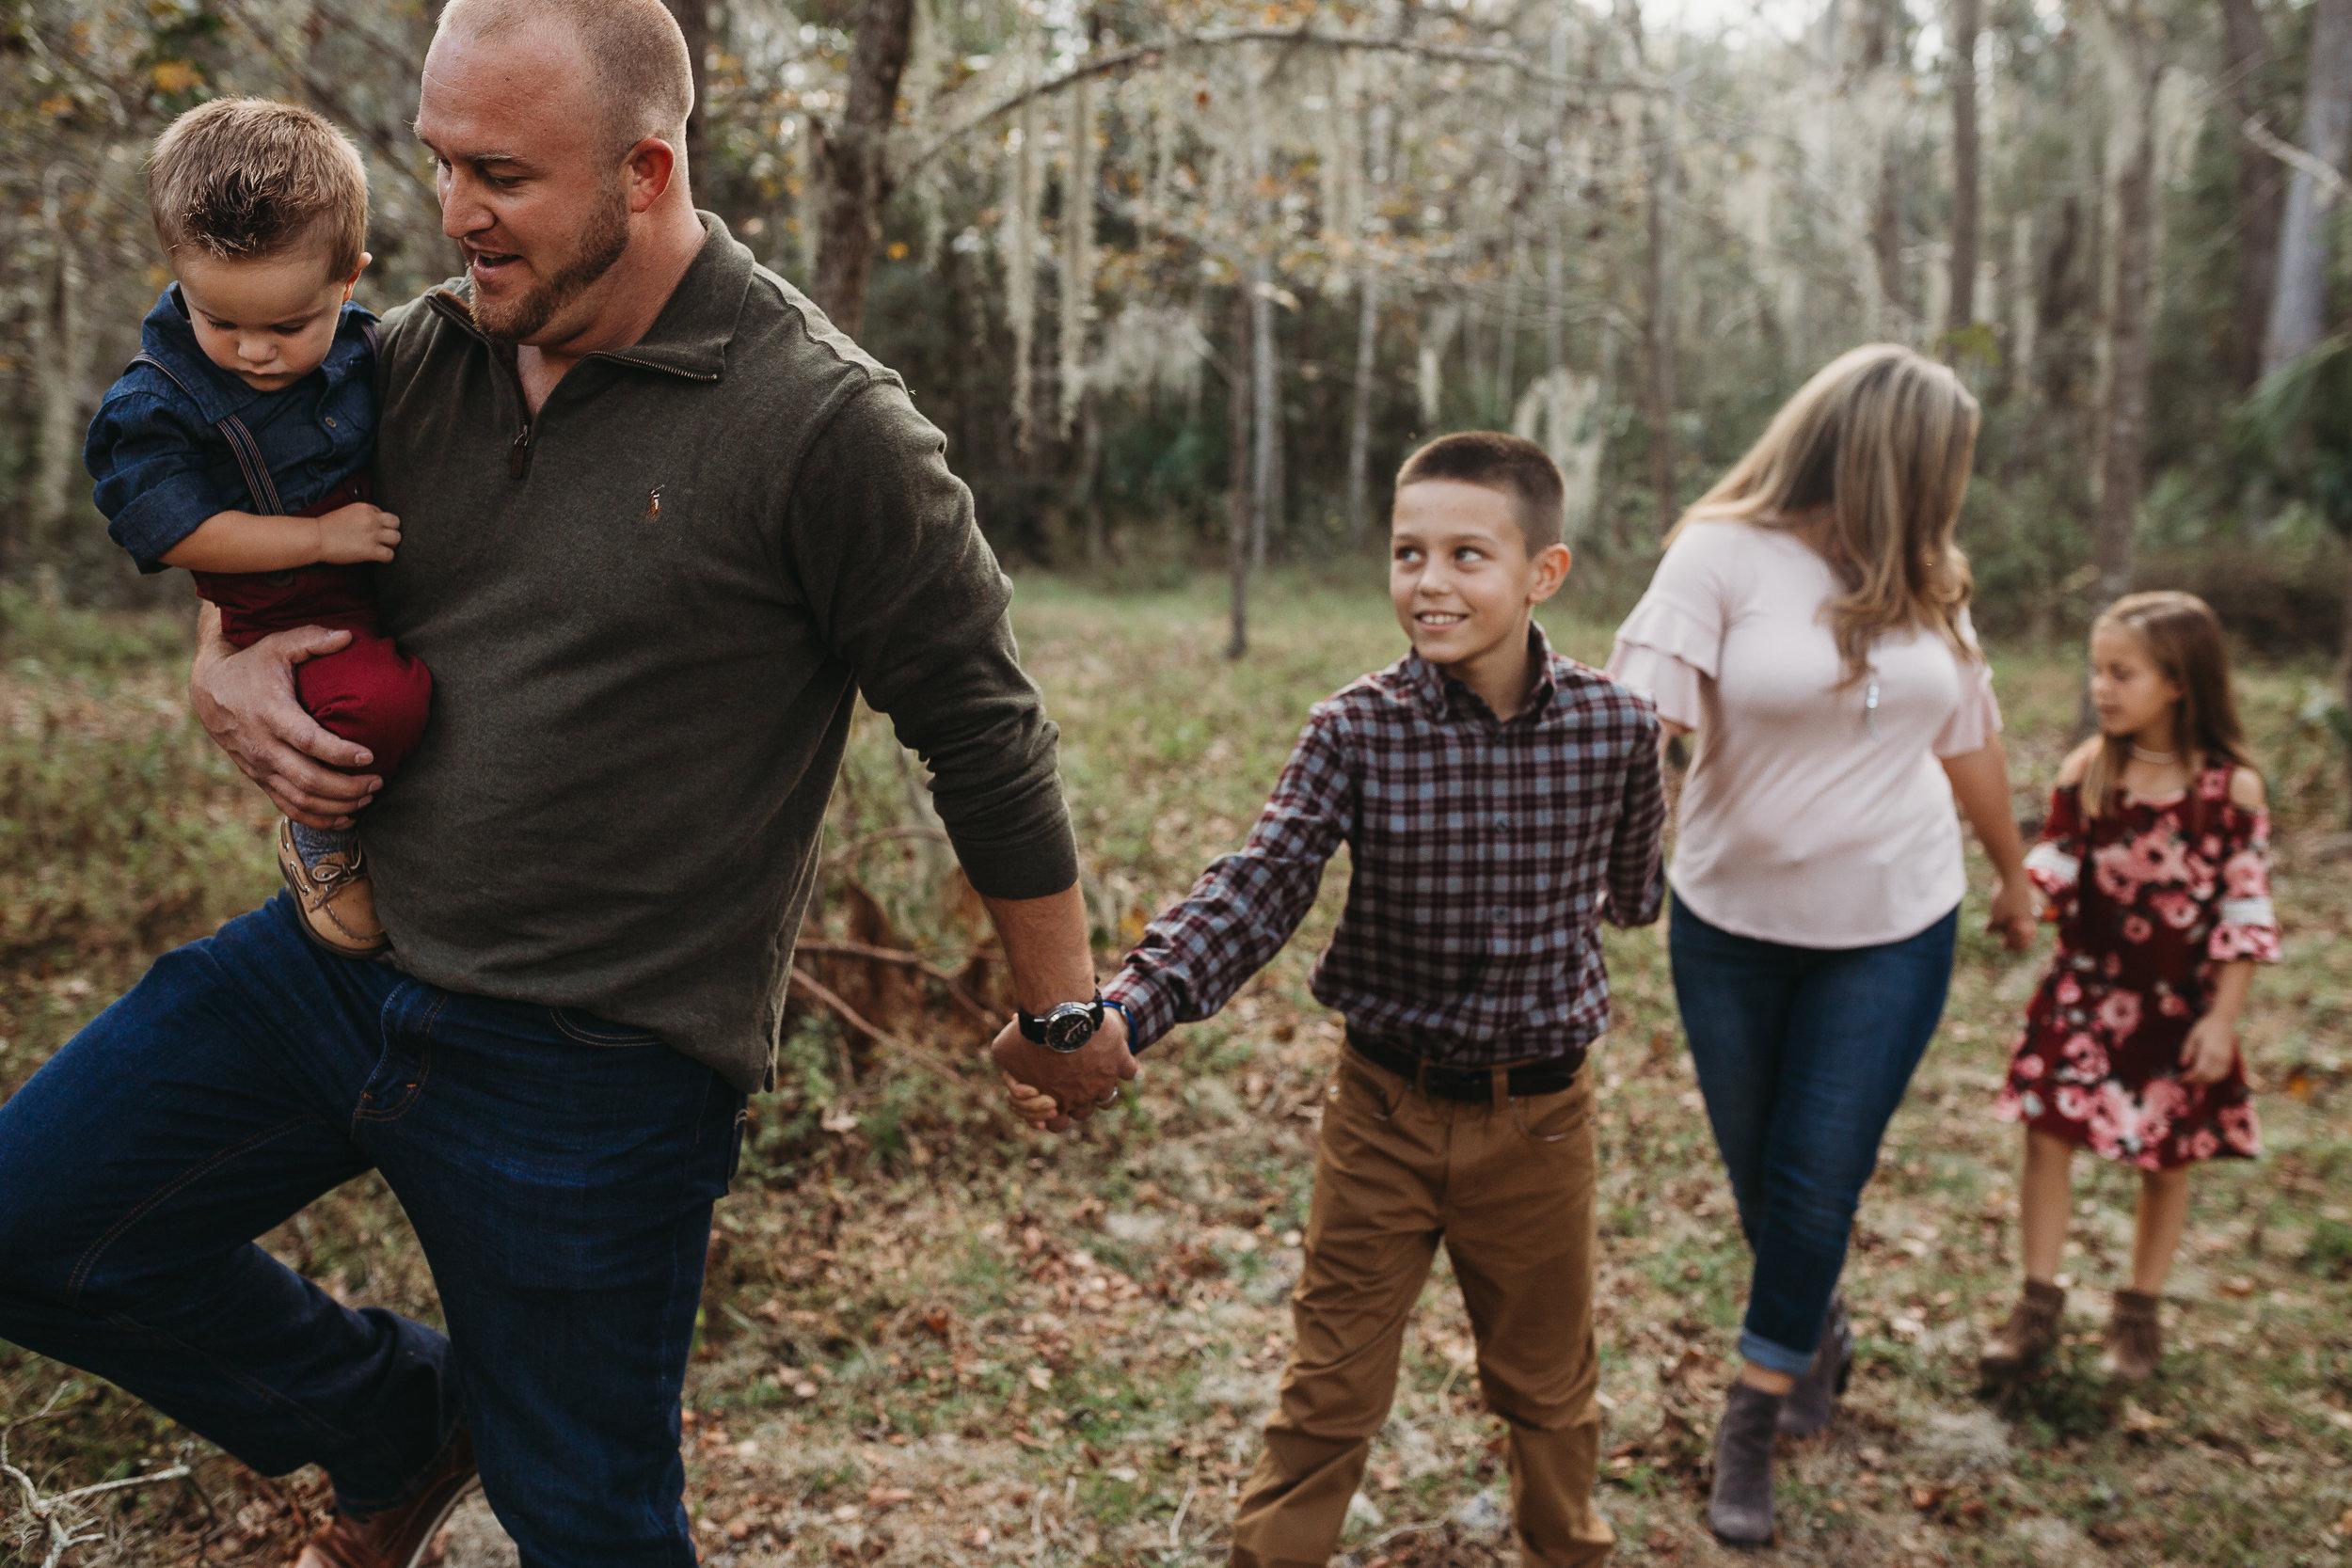 Daytona Beach Family photographer, cute florida family photos and how to dress for christmas photos